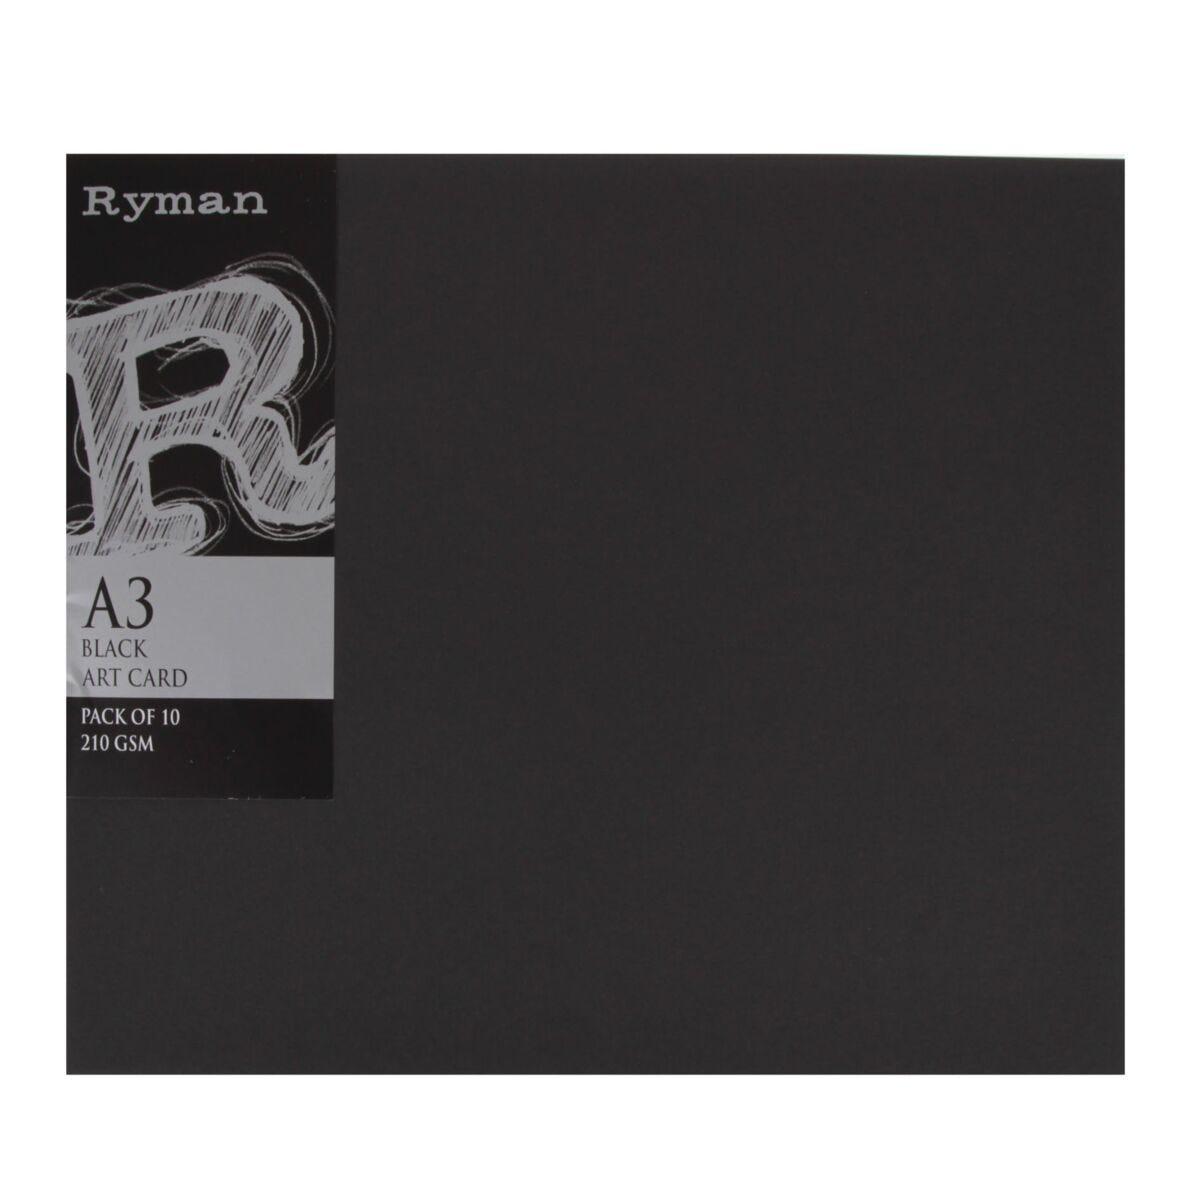 Ryman Artcard A3 210 gsm Pack of 100